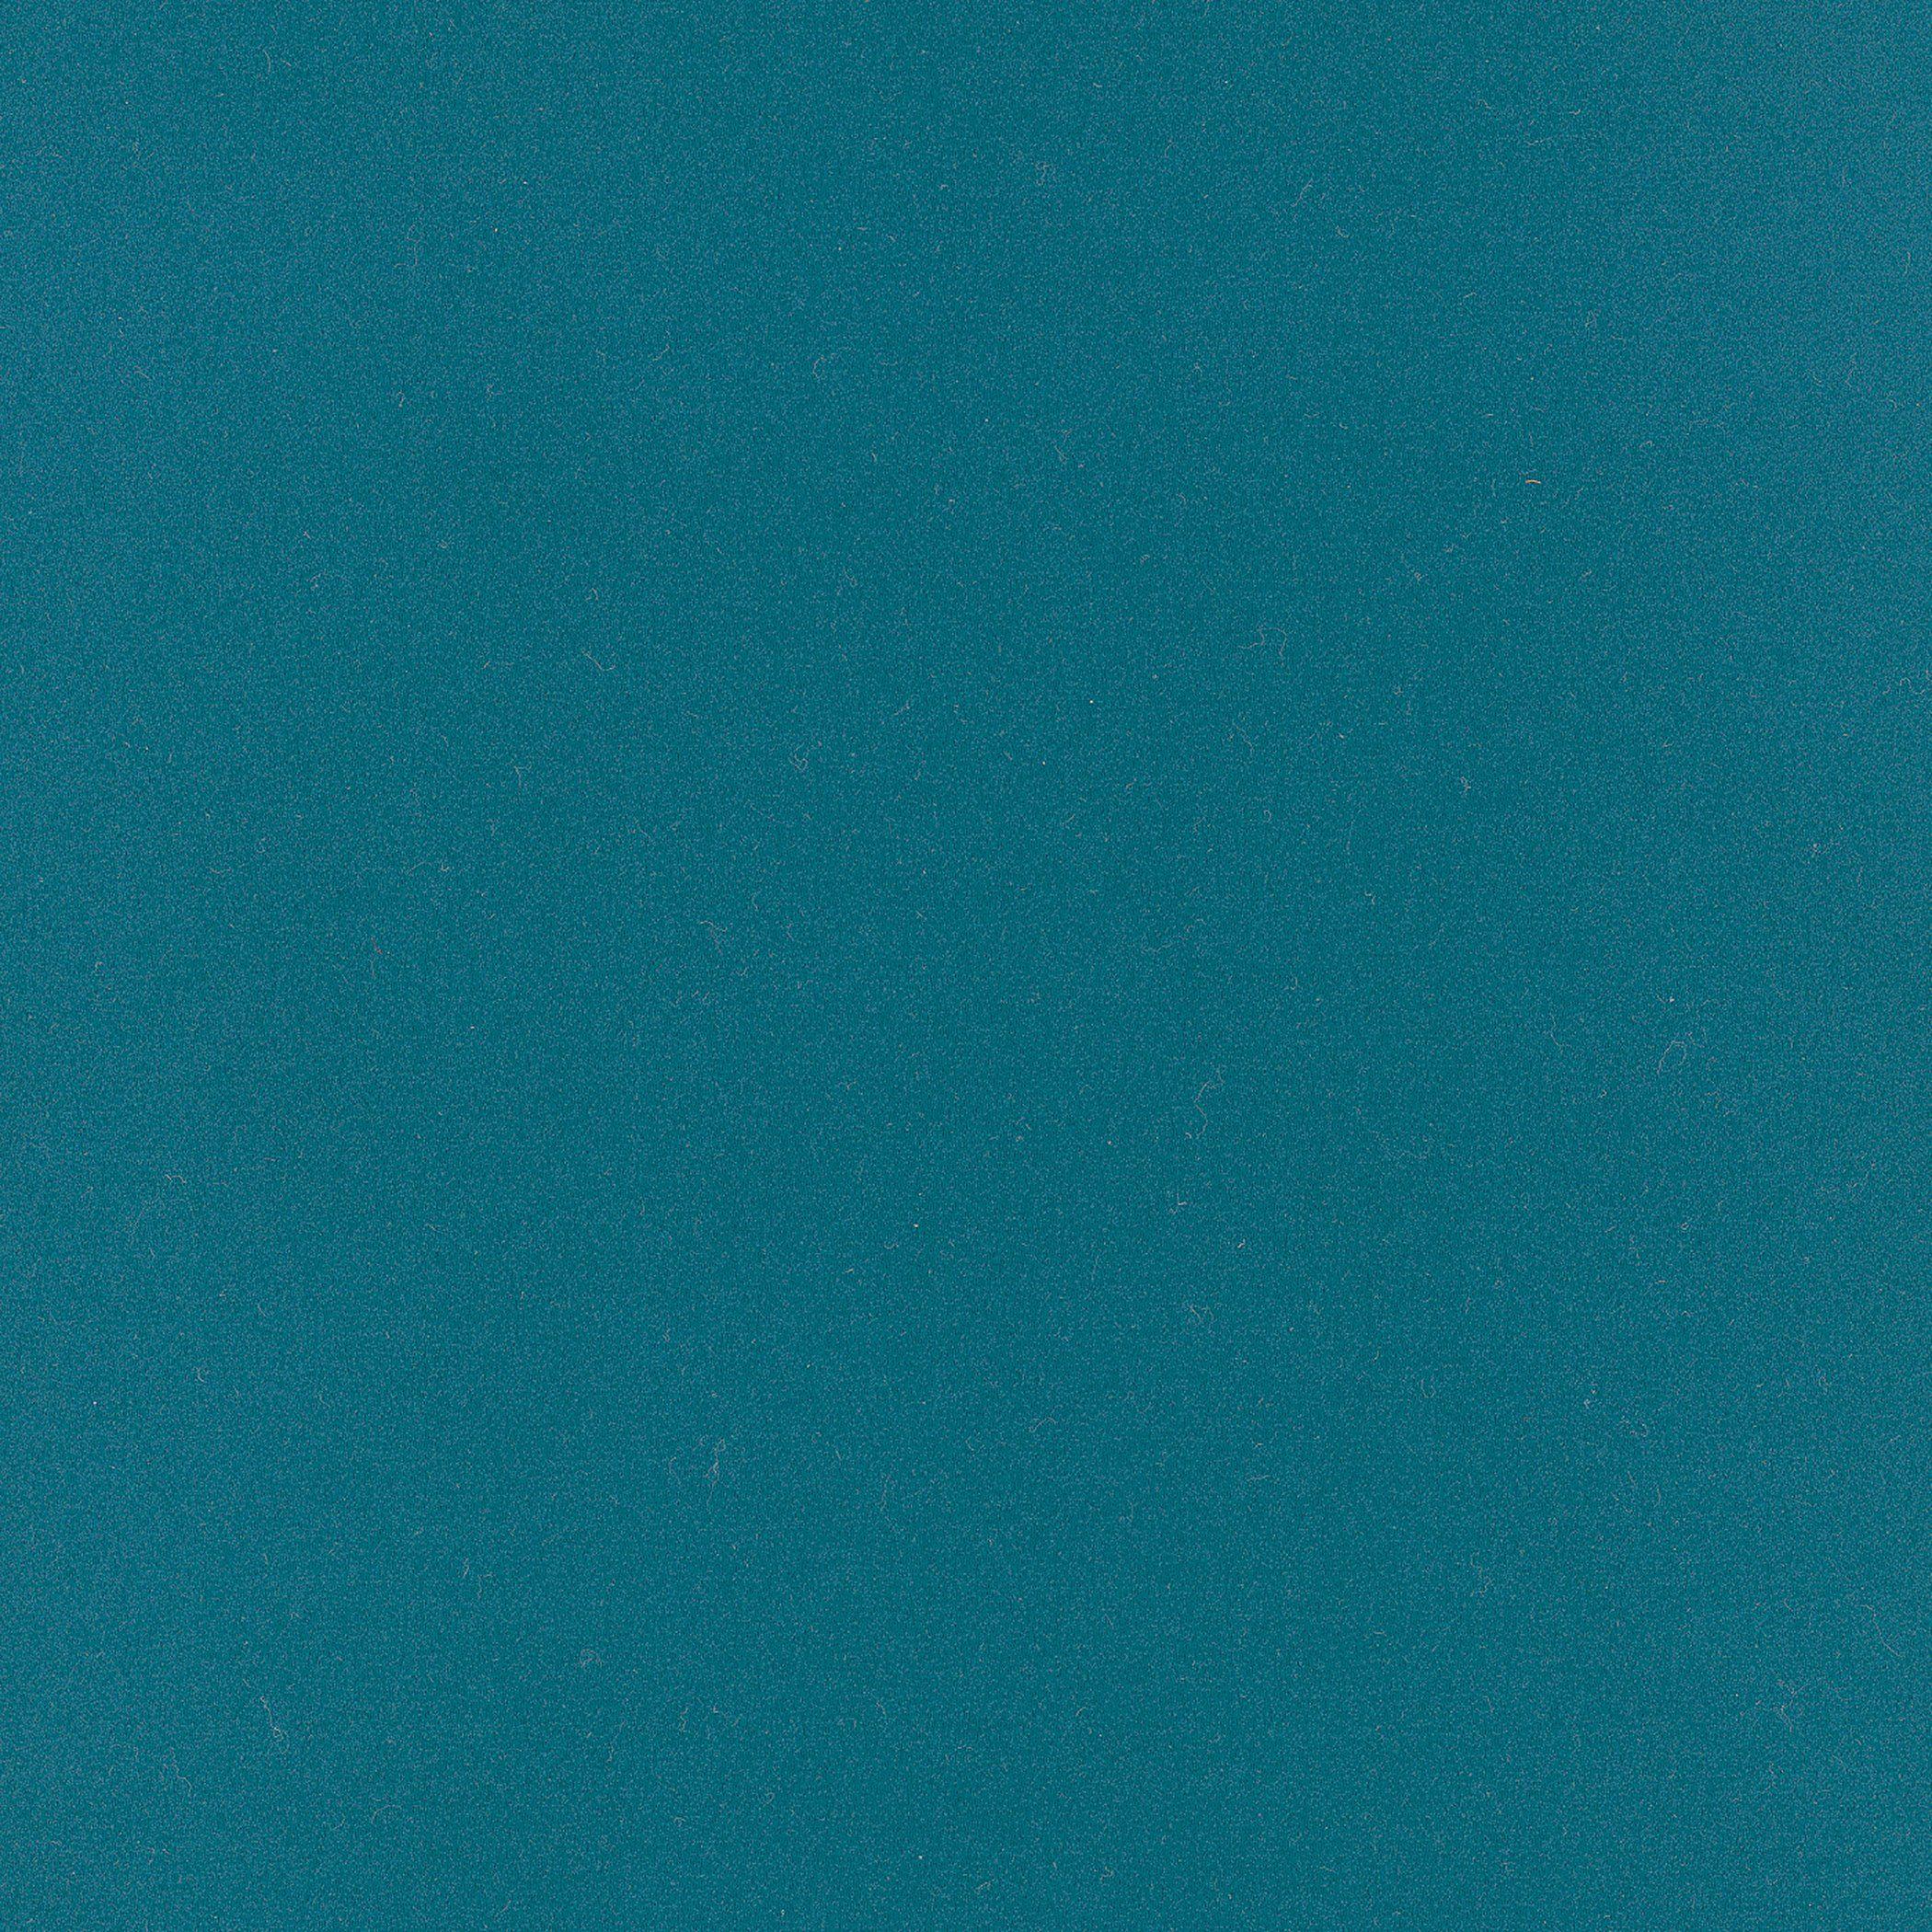 Sateen Aqua Blue Aqua Sky Solid Woven Flat Upholstery Fabric